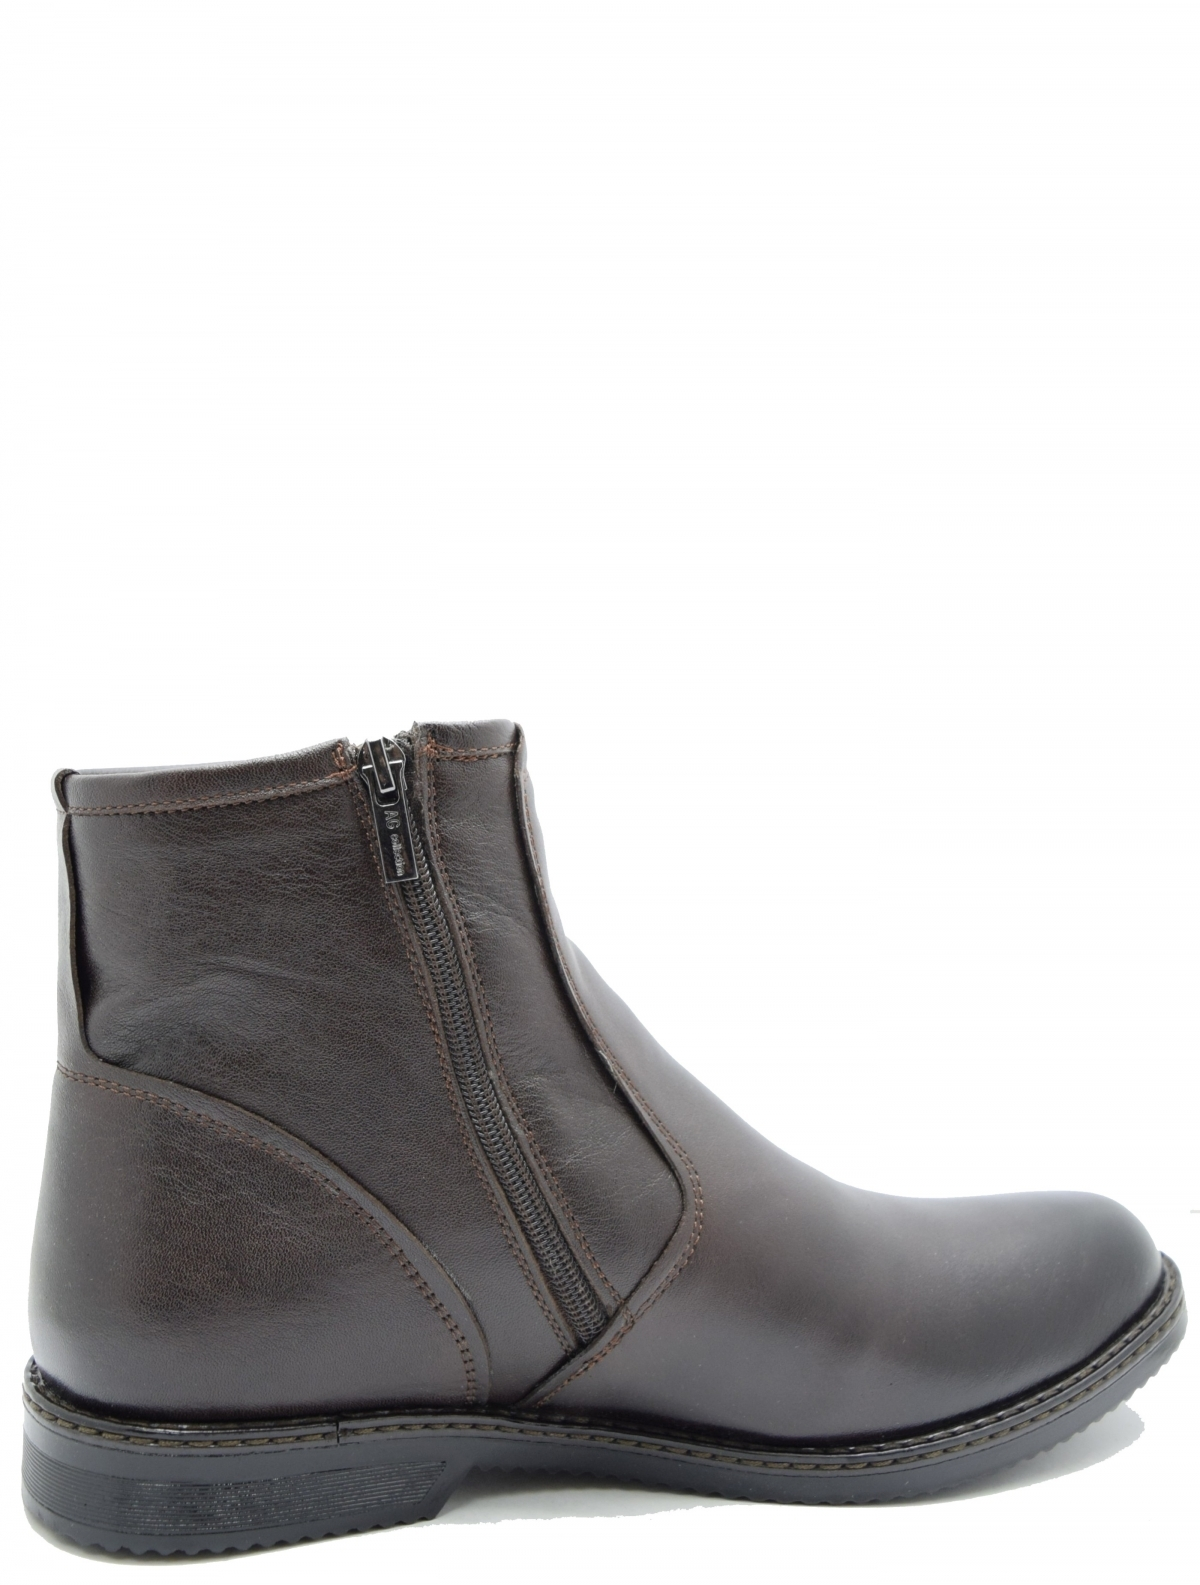 AG 1502-2 мужские ботинки